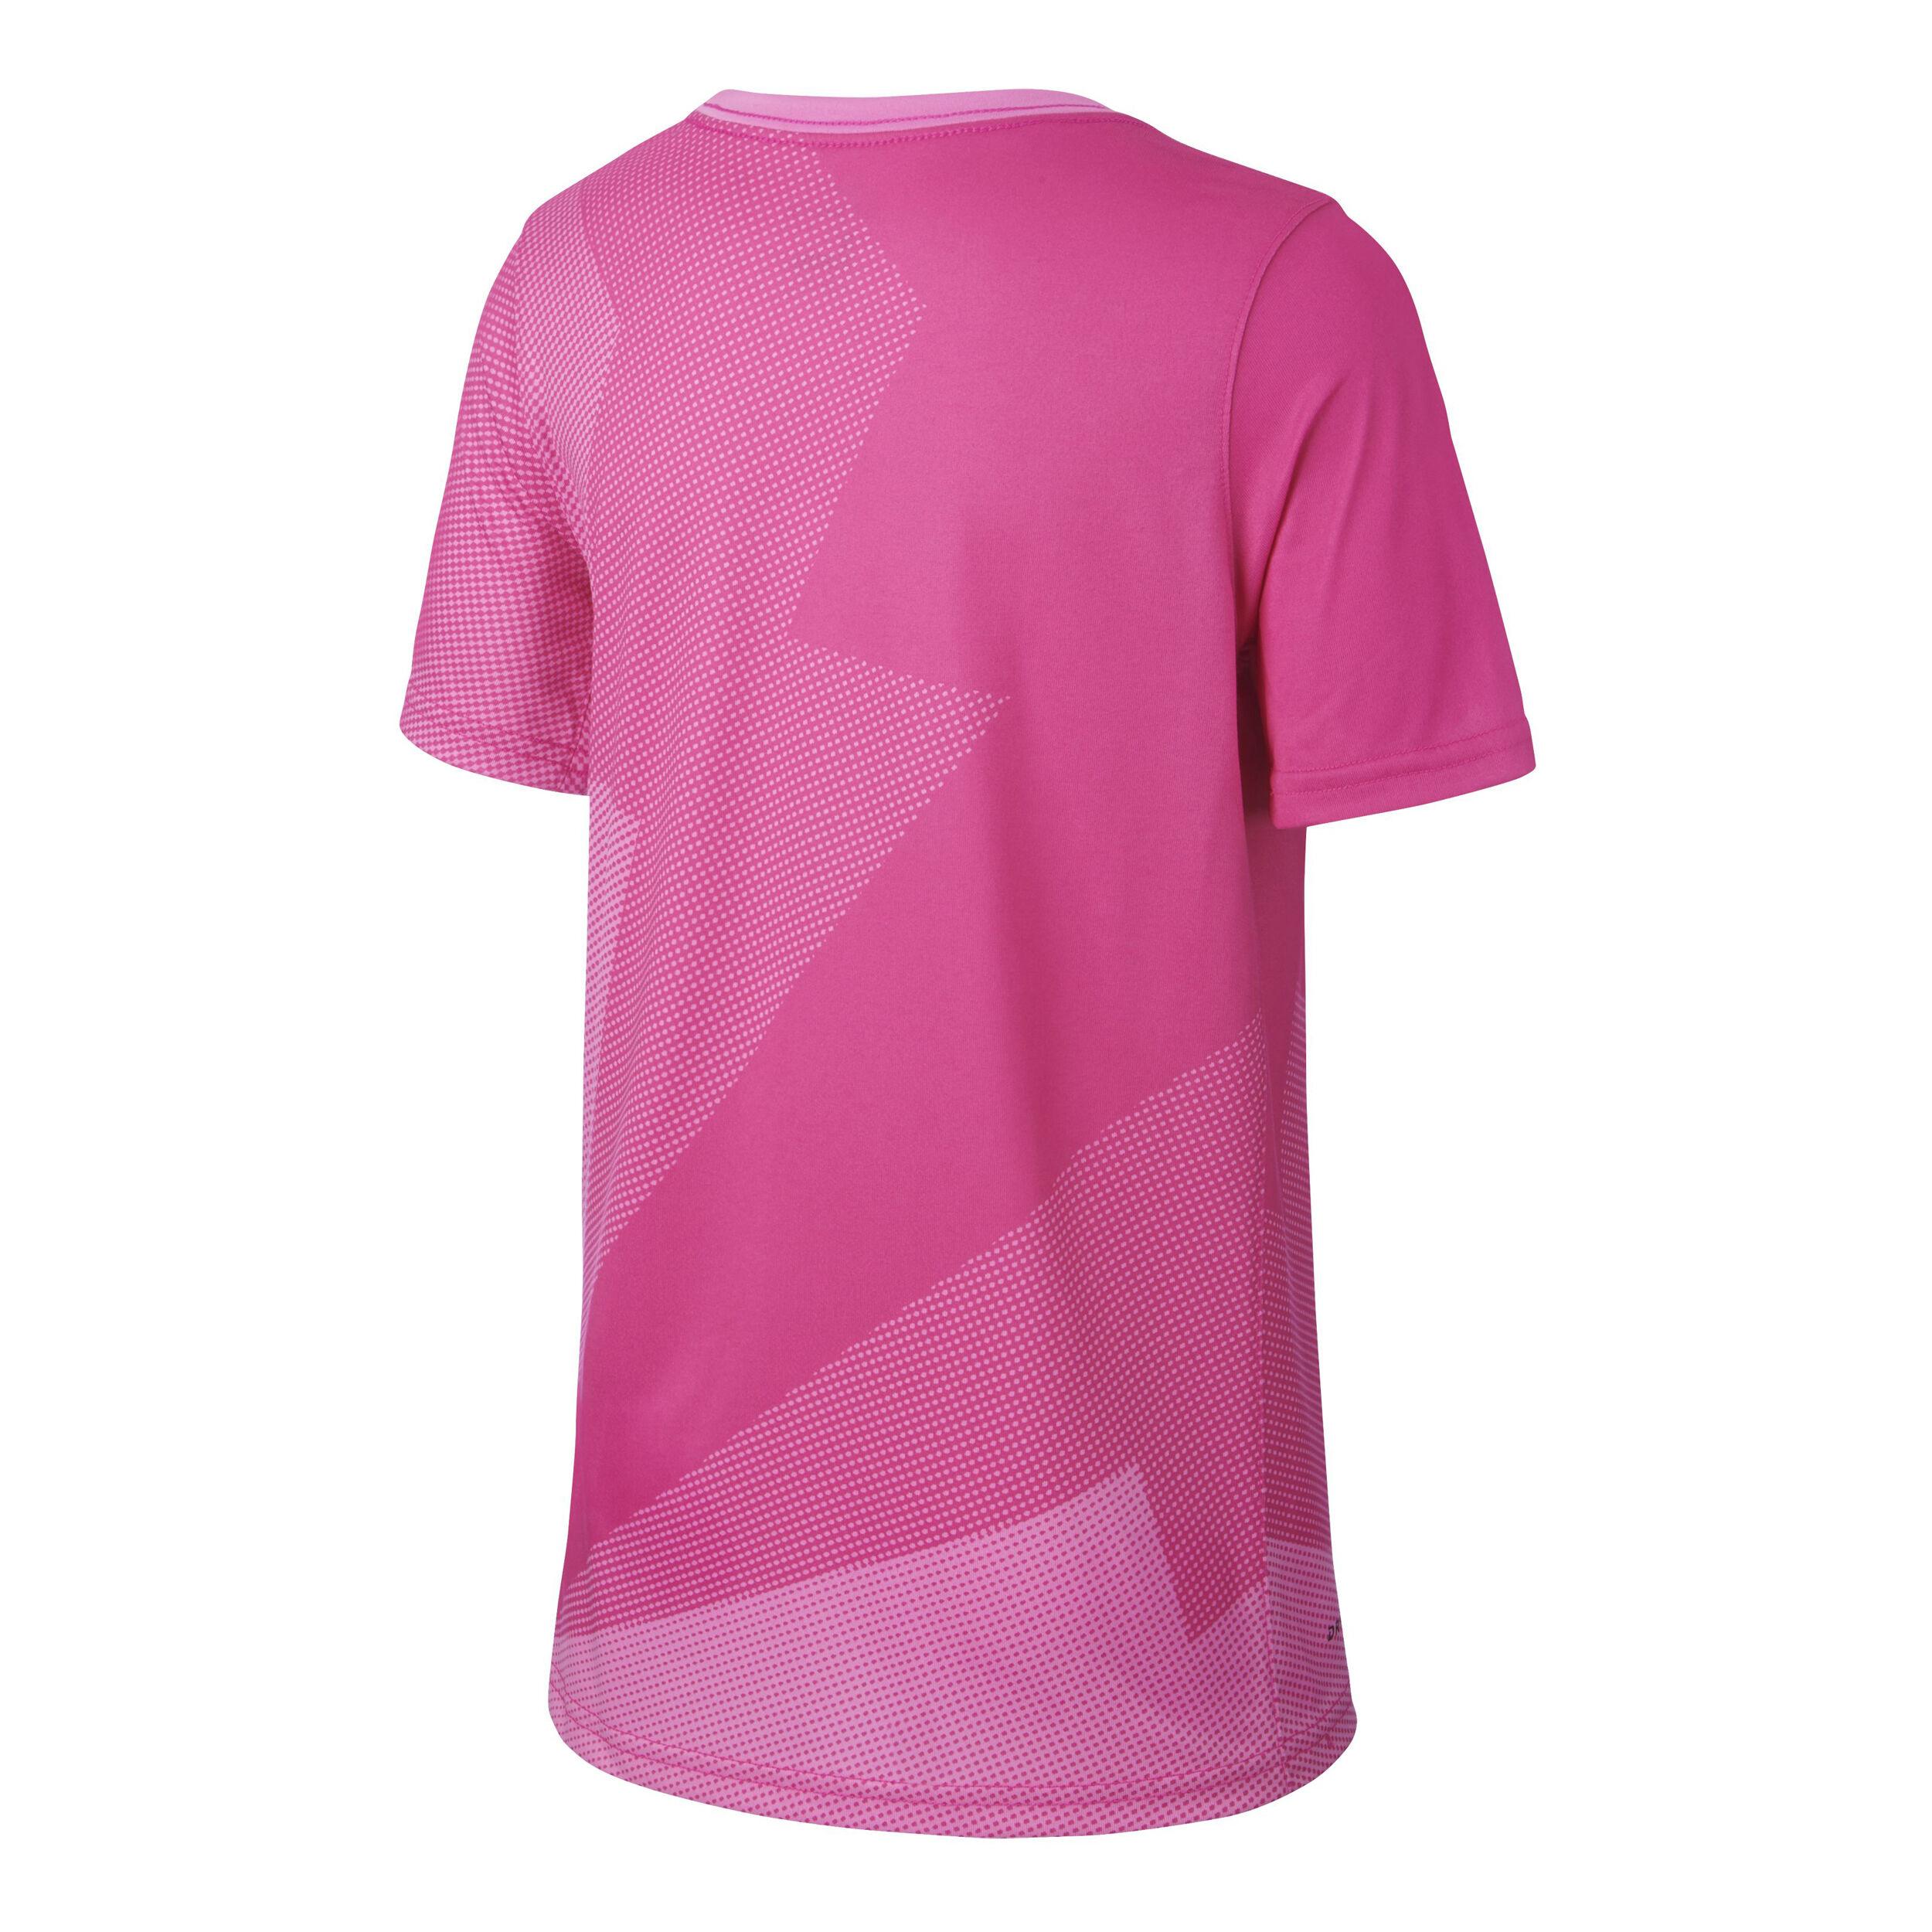 Pinkgris Garçons Court Shirt N0wypnm8ov Gx Foncé Rafael Nadal T Nike Aj54L3RScq